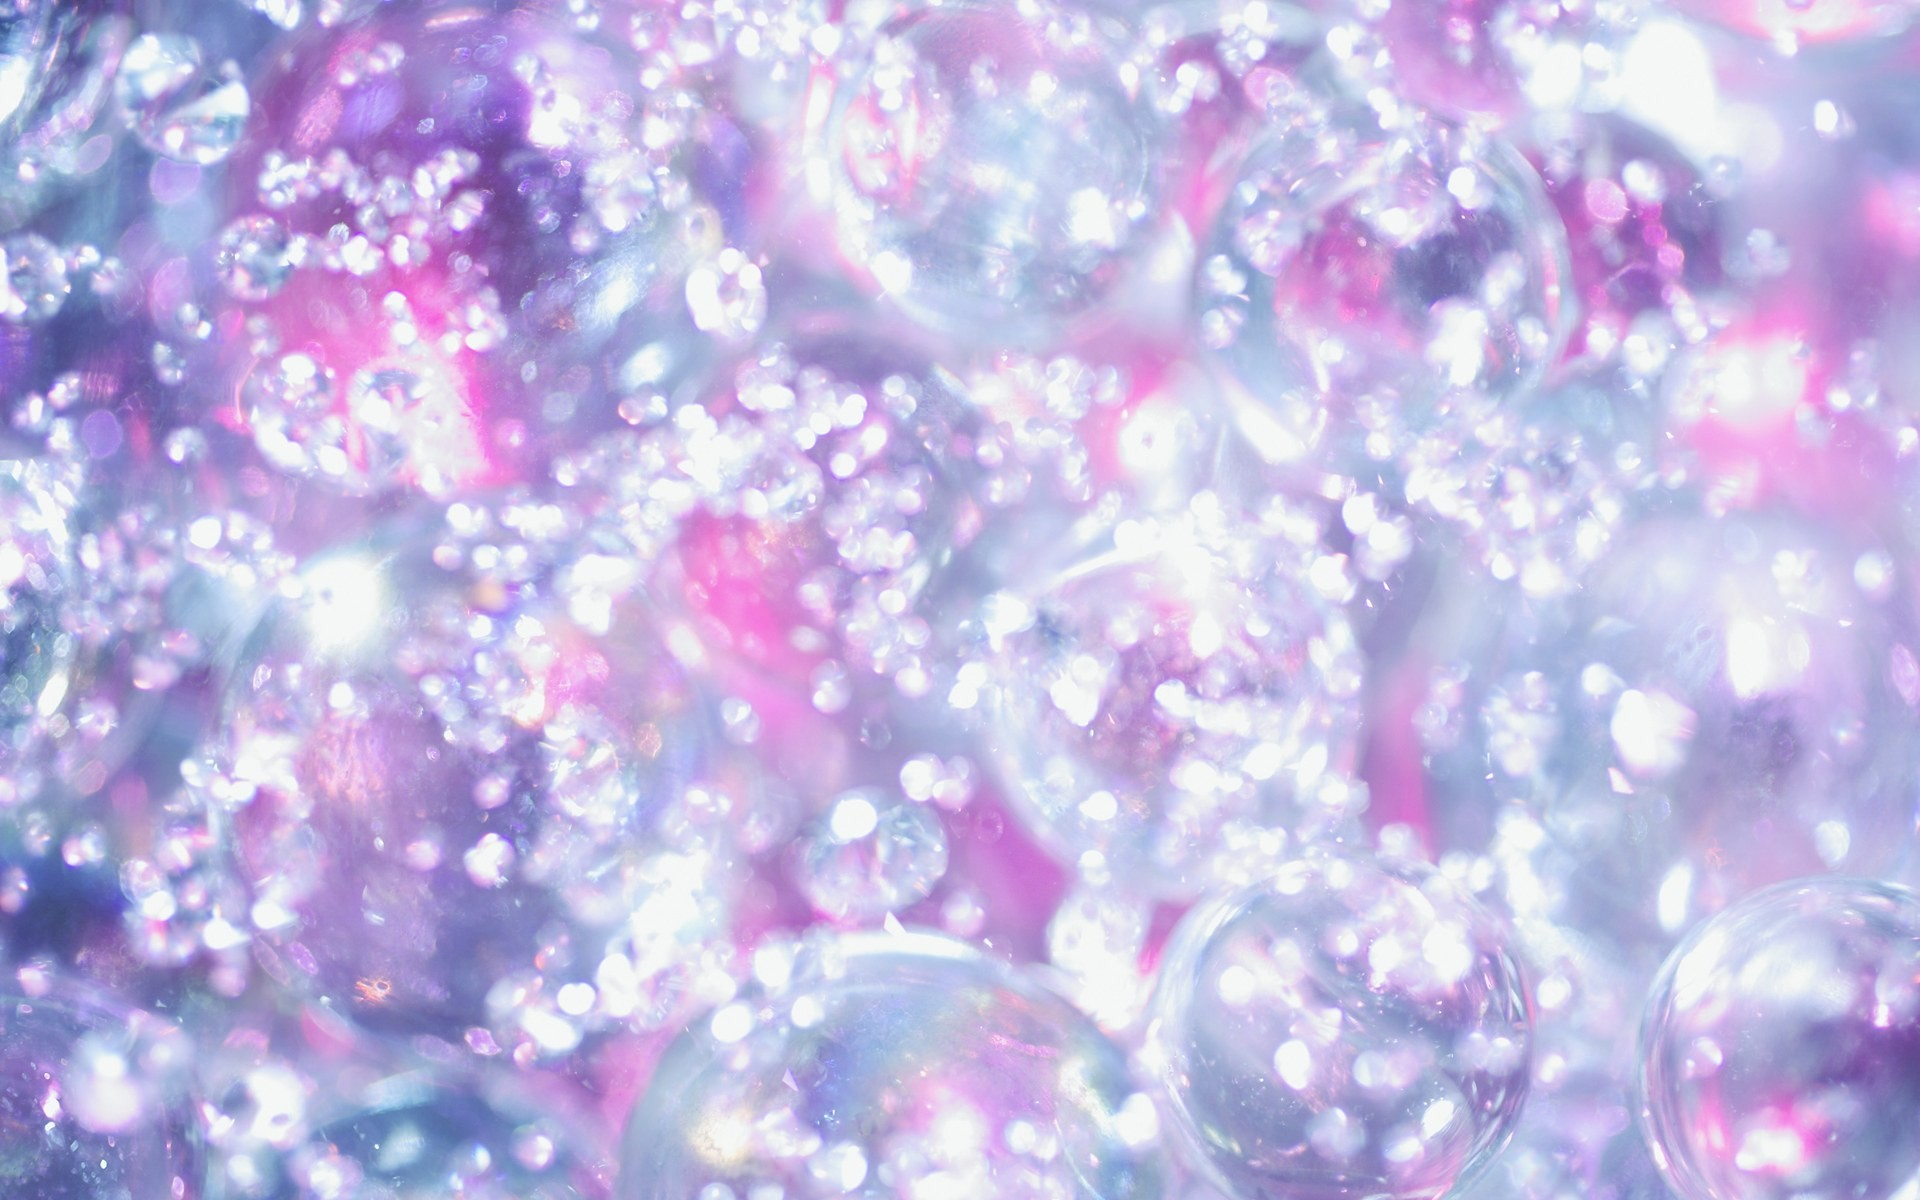 Best Wallpaper Home Screen Glitter - 818237-best-wallpaper-glitter-1920x1200-for-lockscreen  Trends_82177.jpg